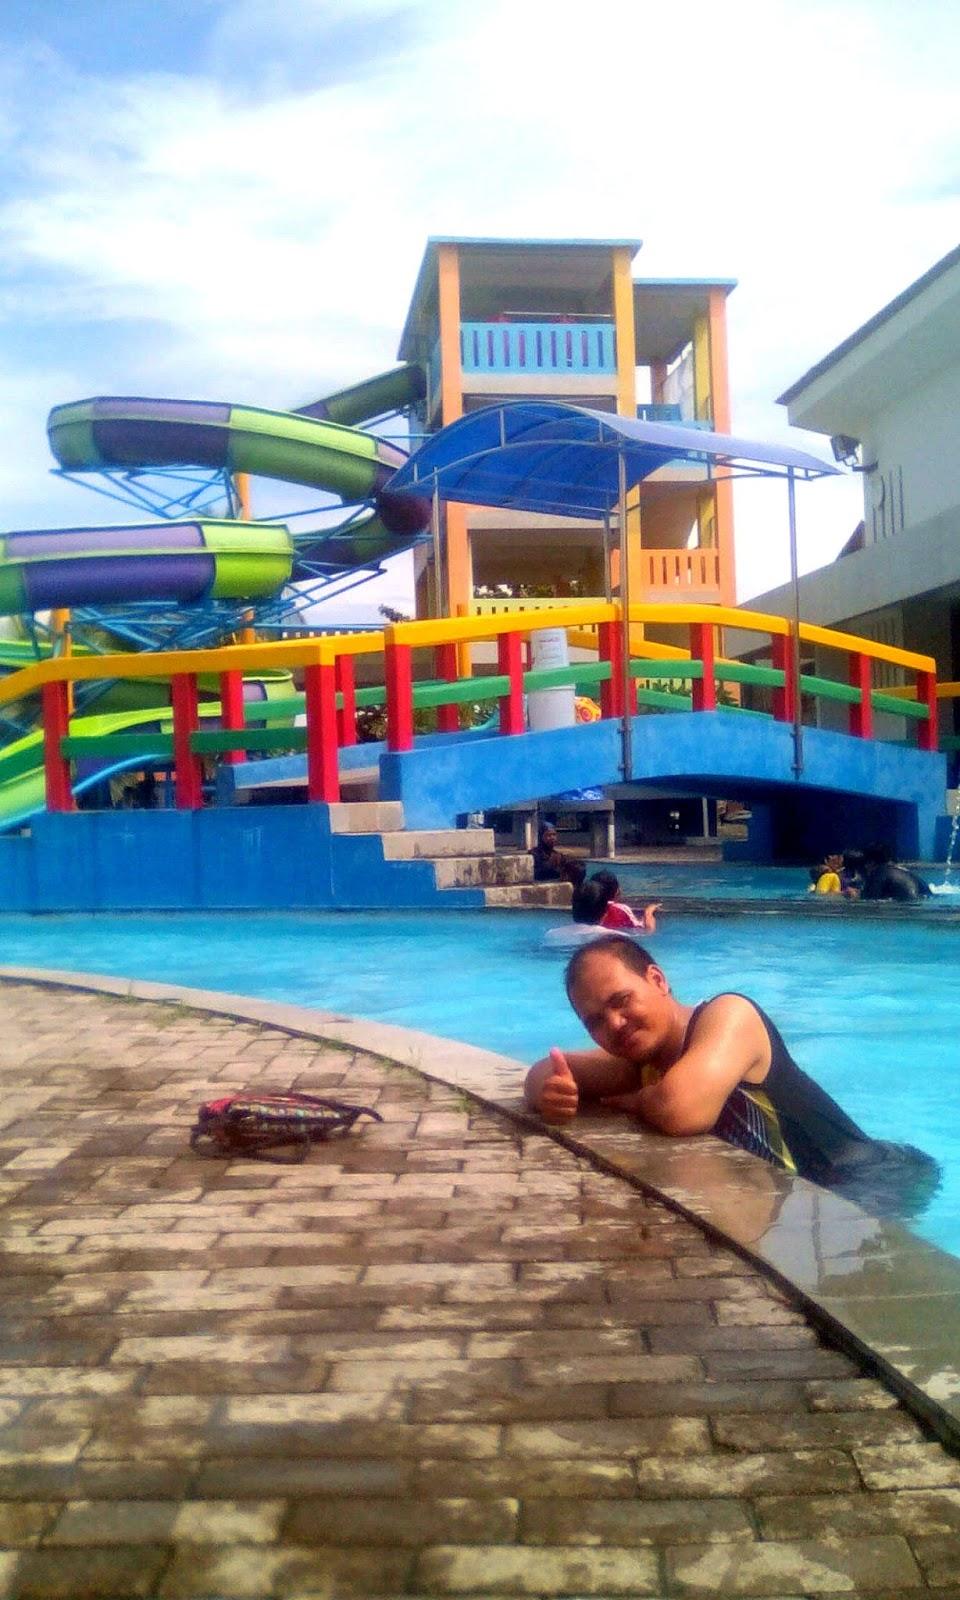 Biarkan Puas Bermain Air Tirta Mas Waterboom Riepe Journey Tak